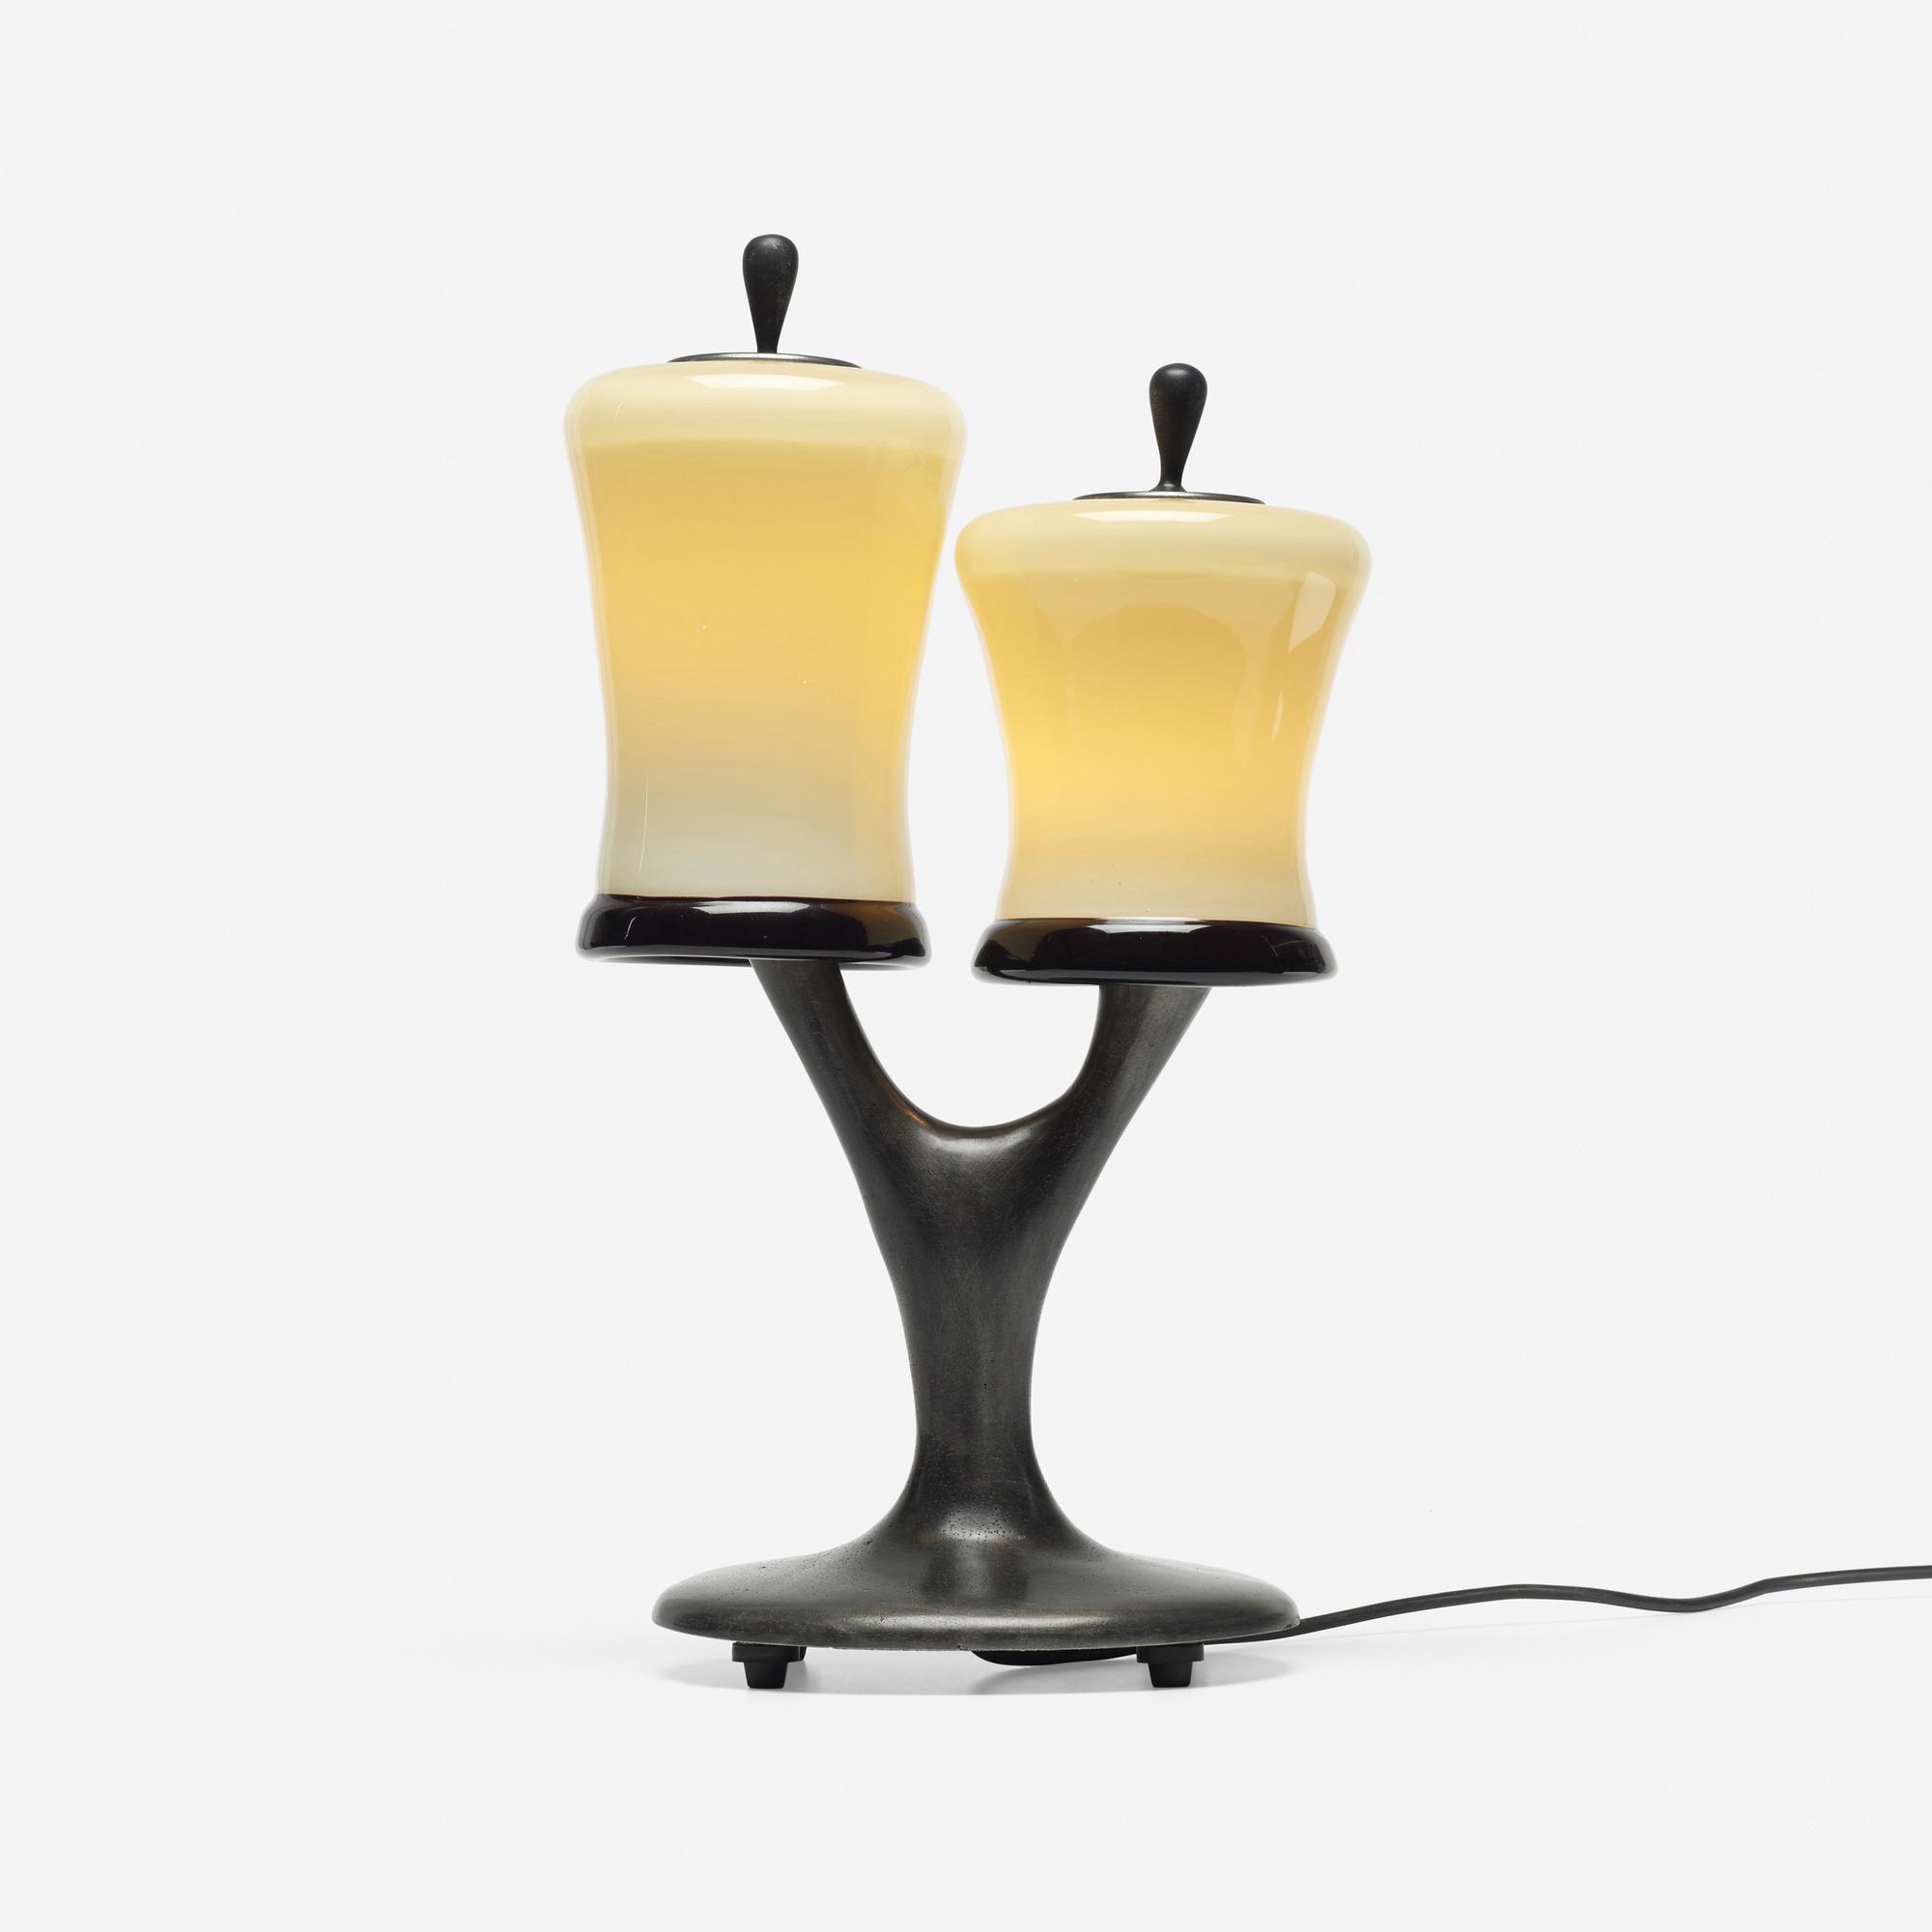 193: Jordan Mozer / prototype Twin lamp (1 of 2)